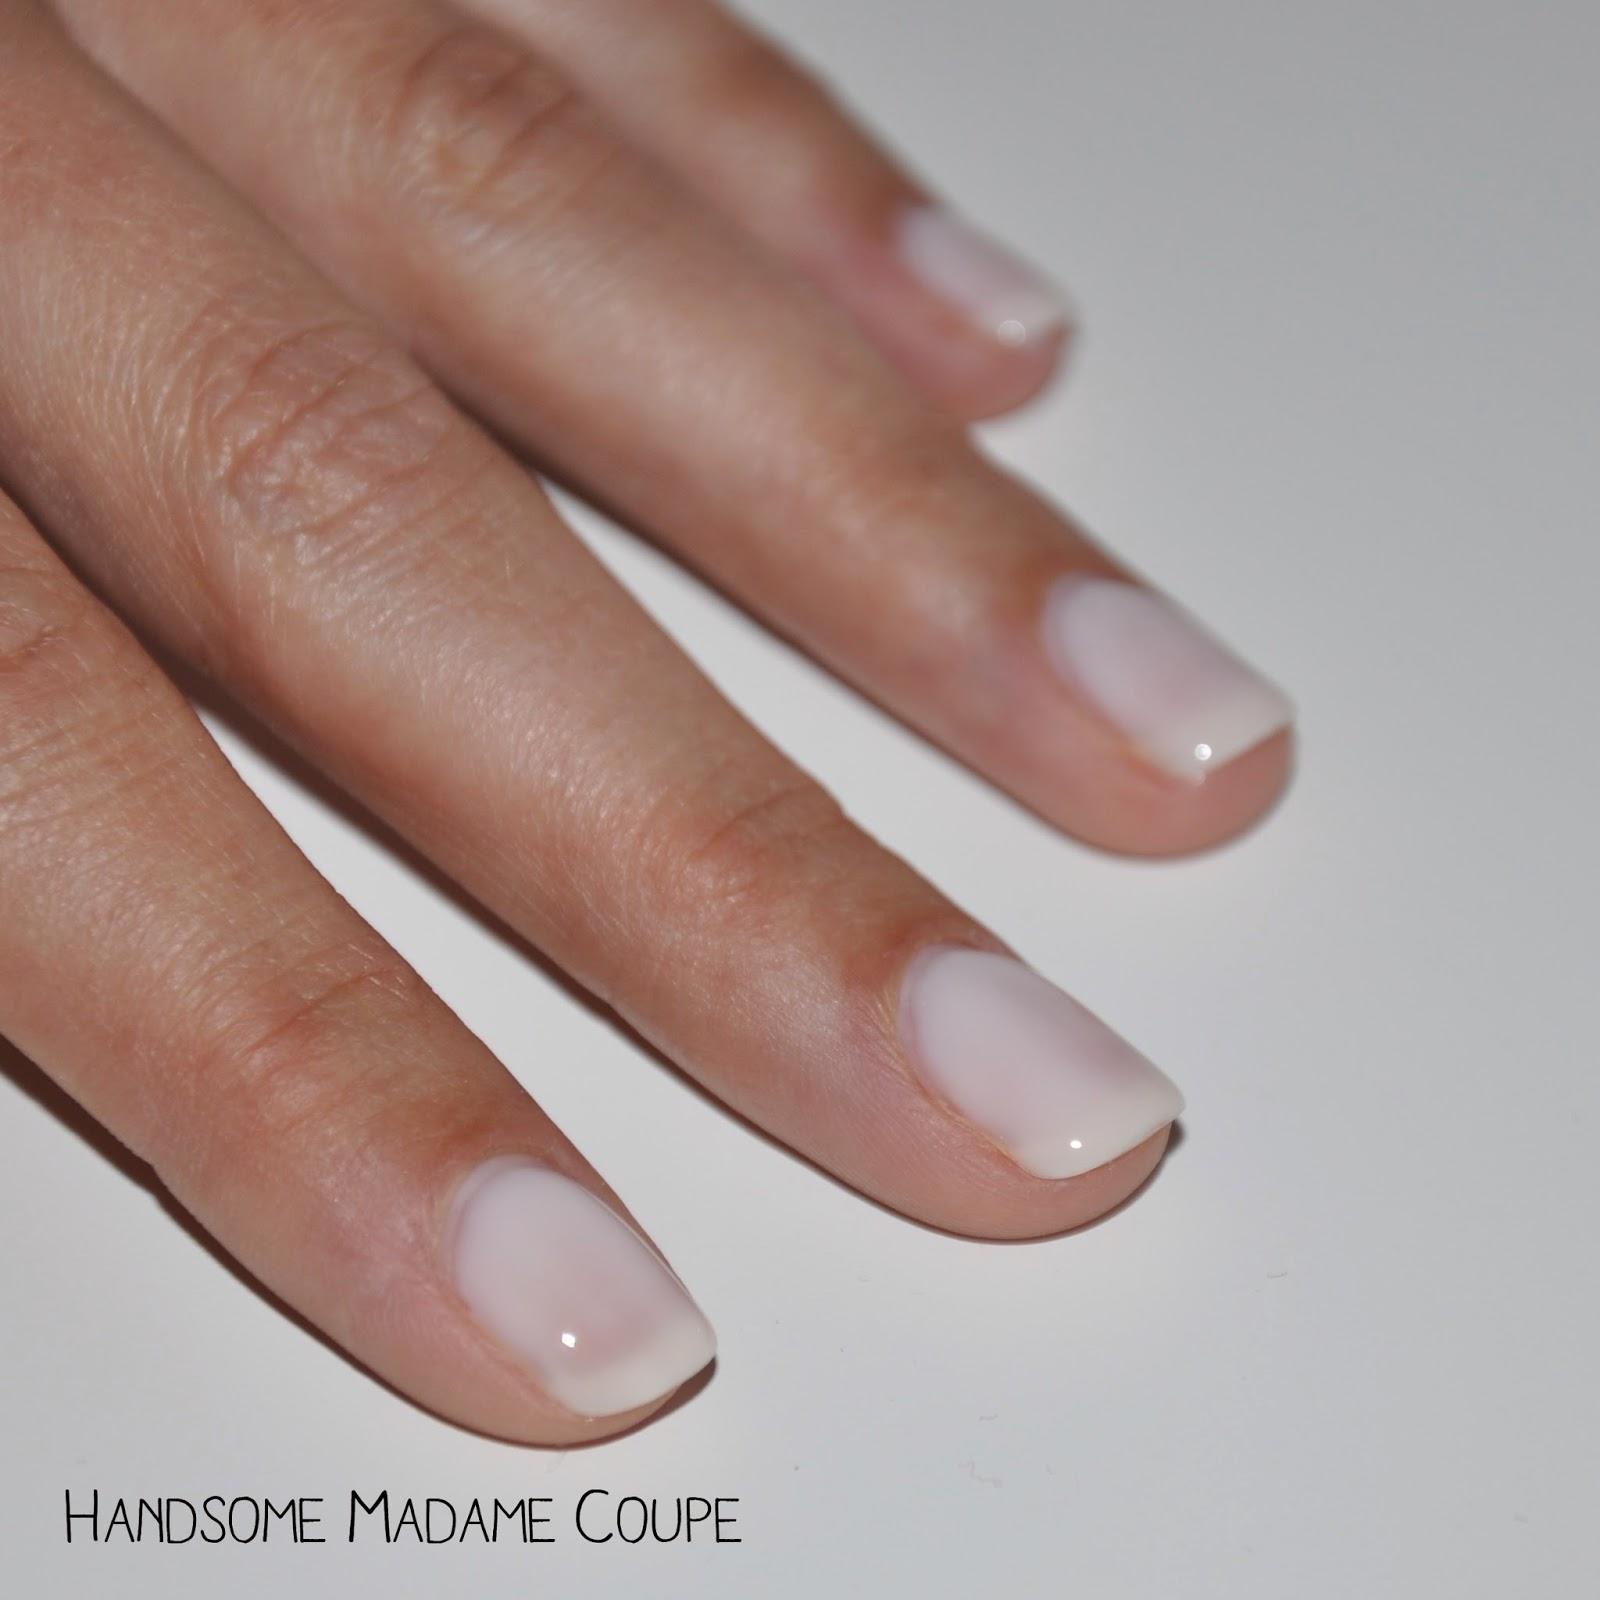 Hand-some Girls: CND Shellac UV-Nagellack